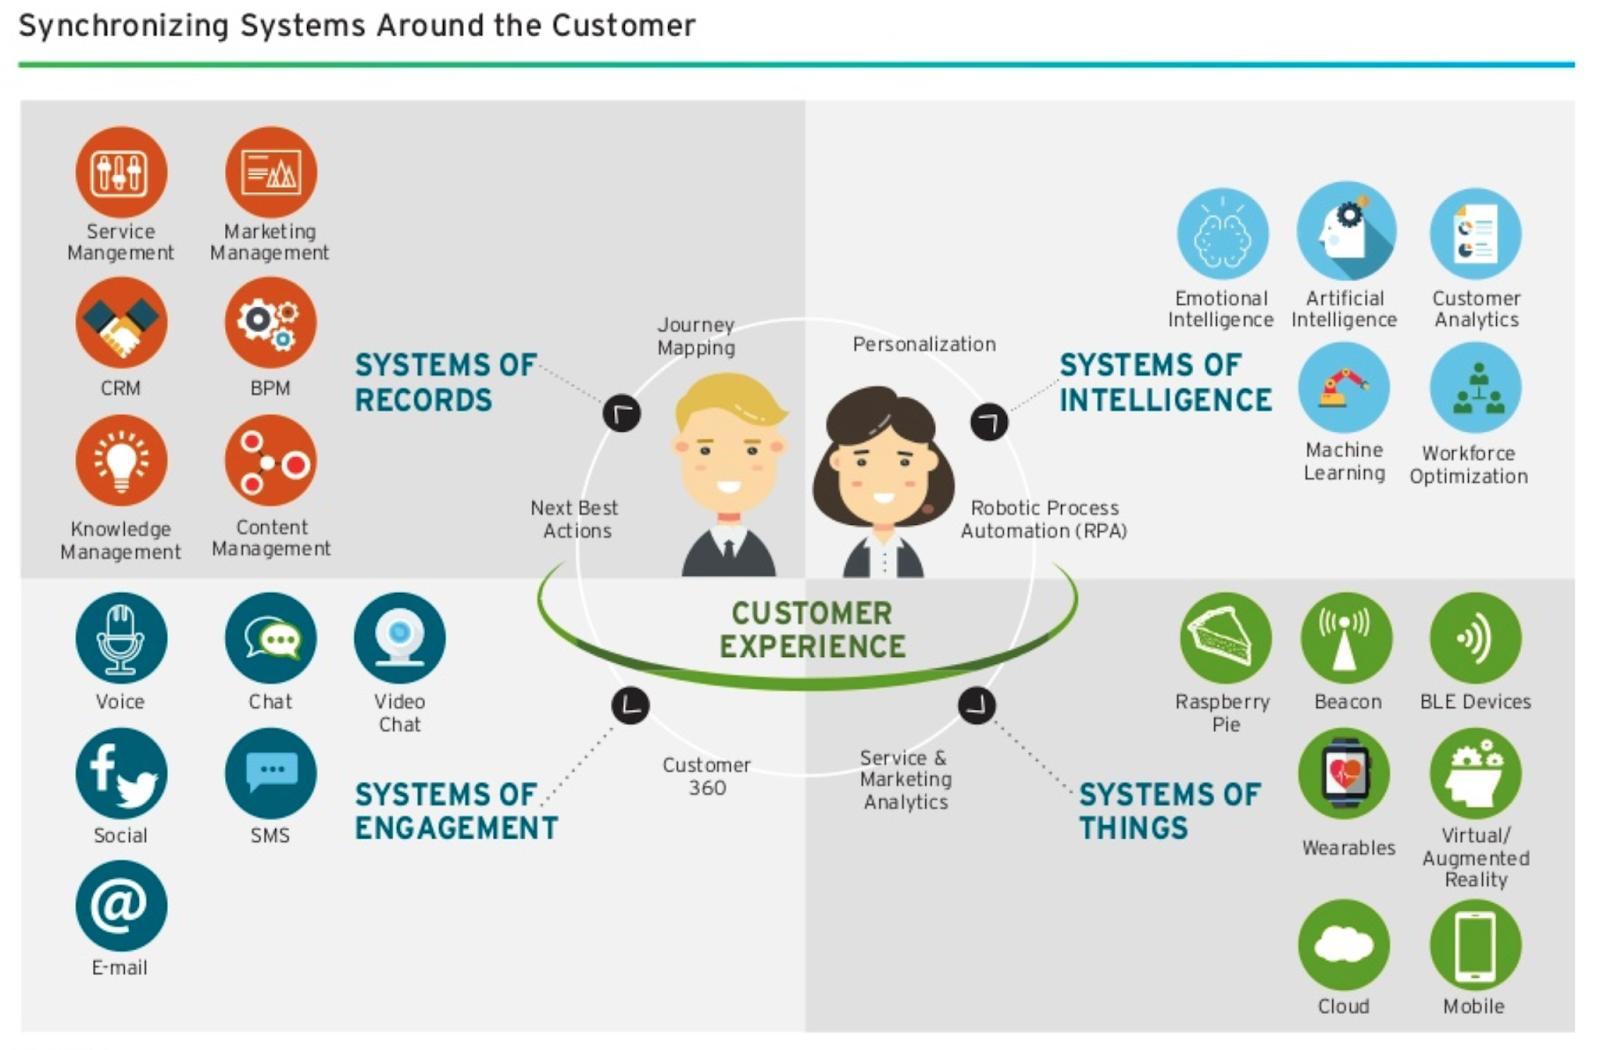 Where to find customer data - Selling customer data